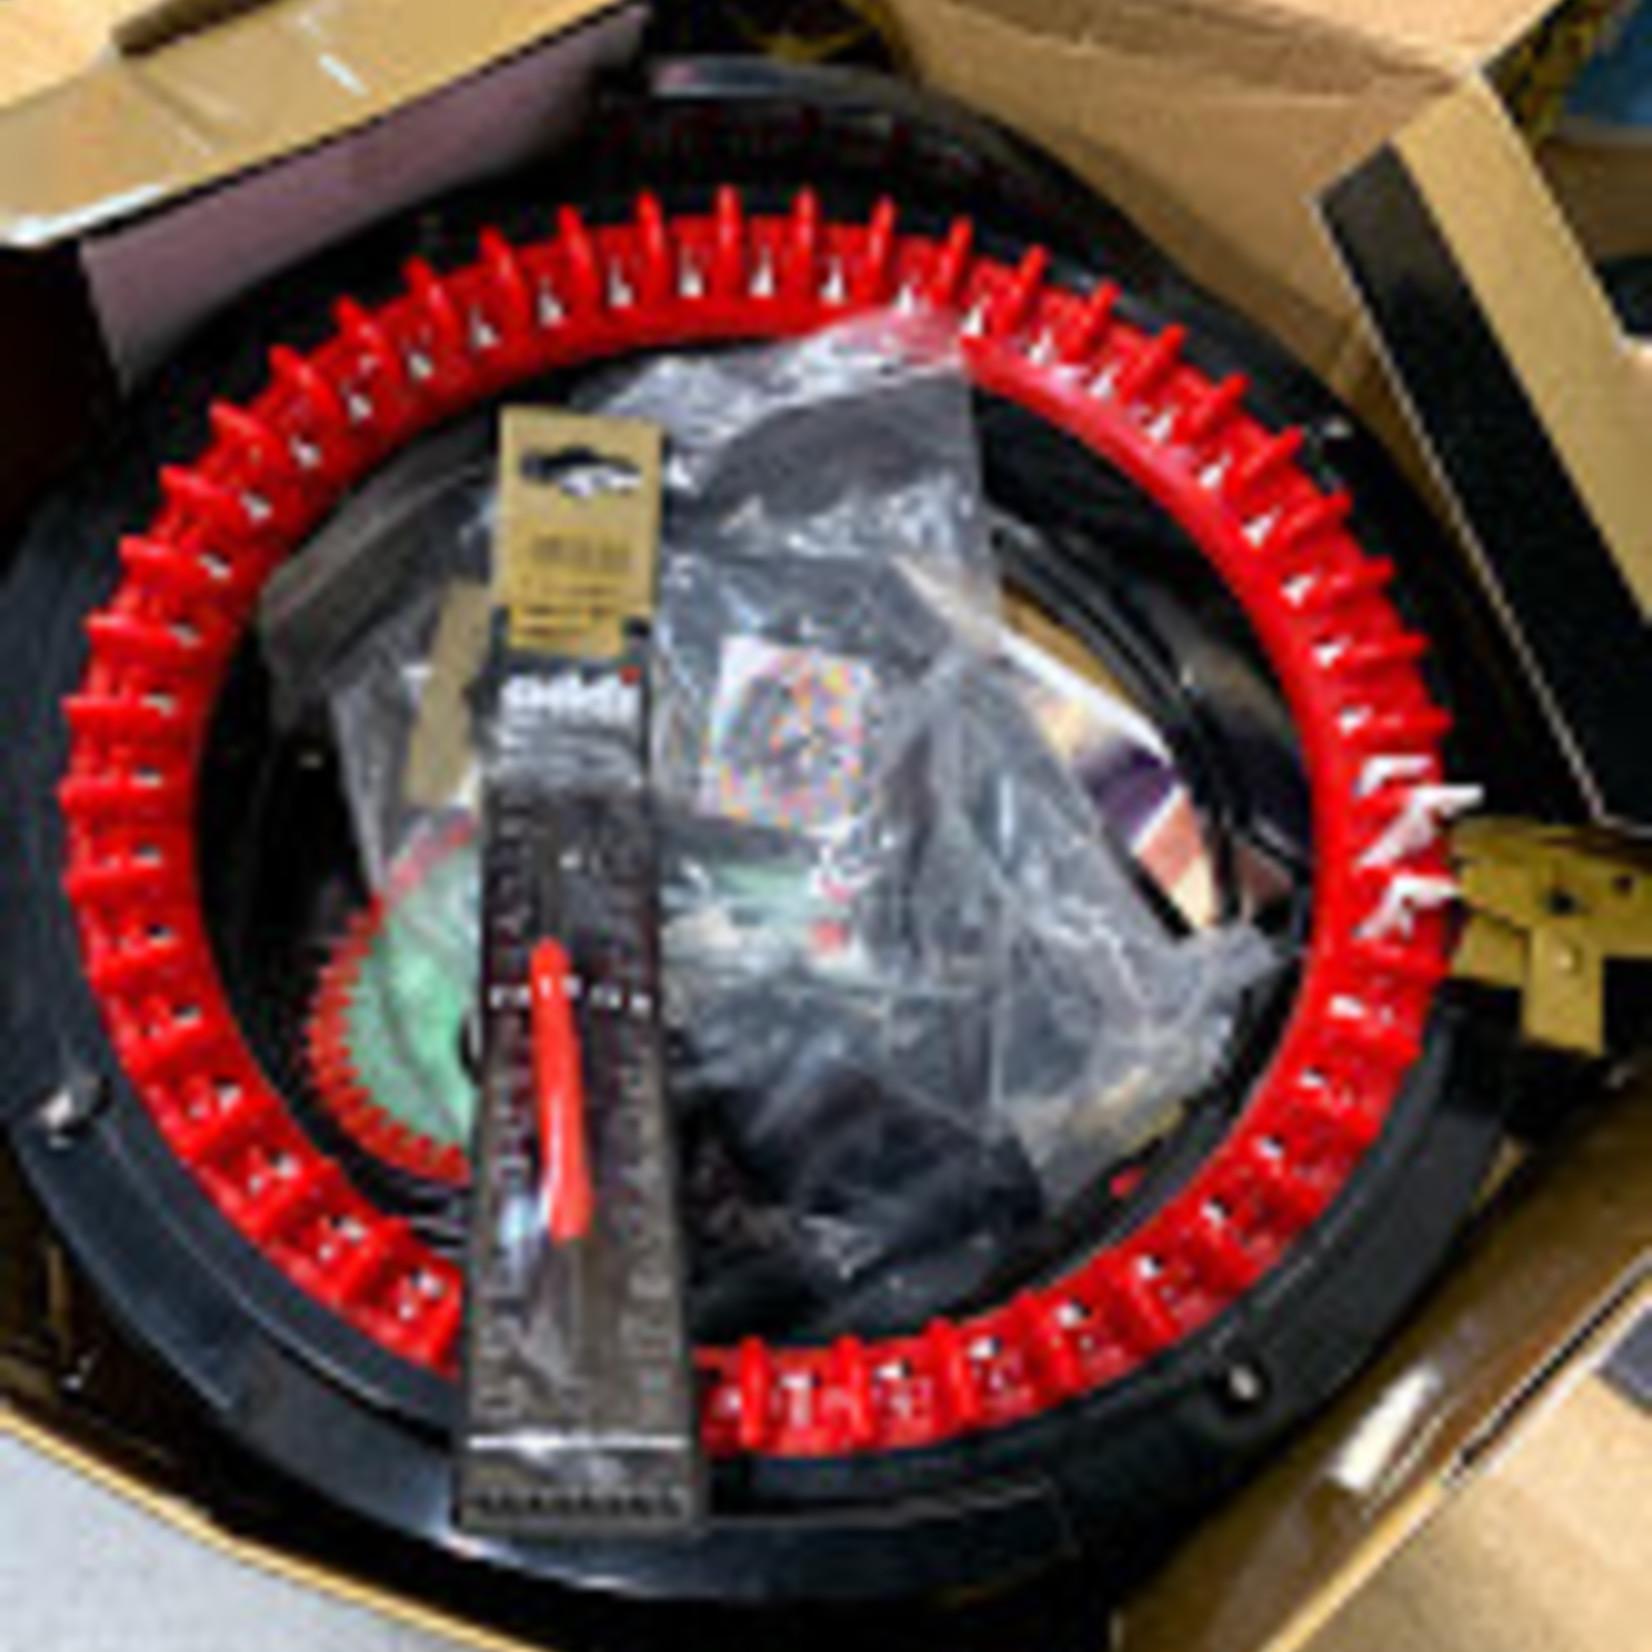 ADDI EXPRESS KINGSIZE - CIRCULAR KNITTING MACHINE *Open box, missing one plastic needle